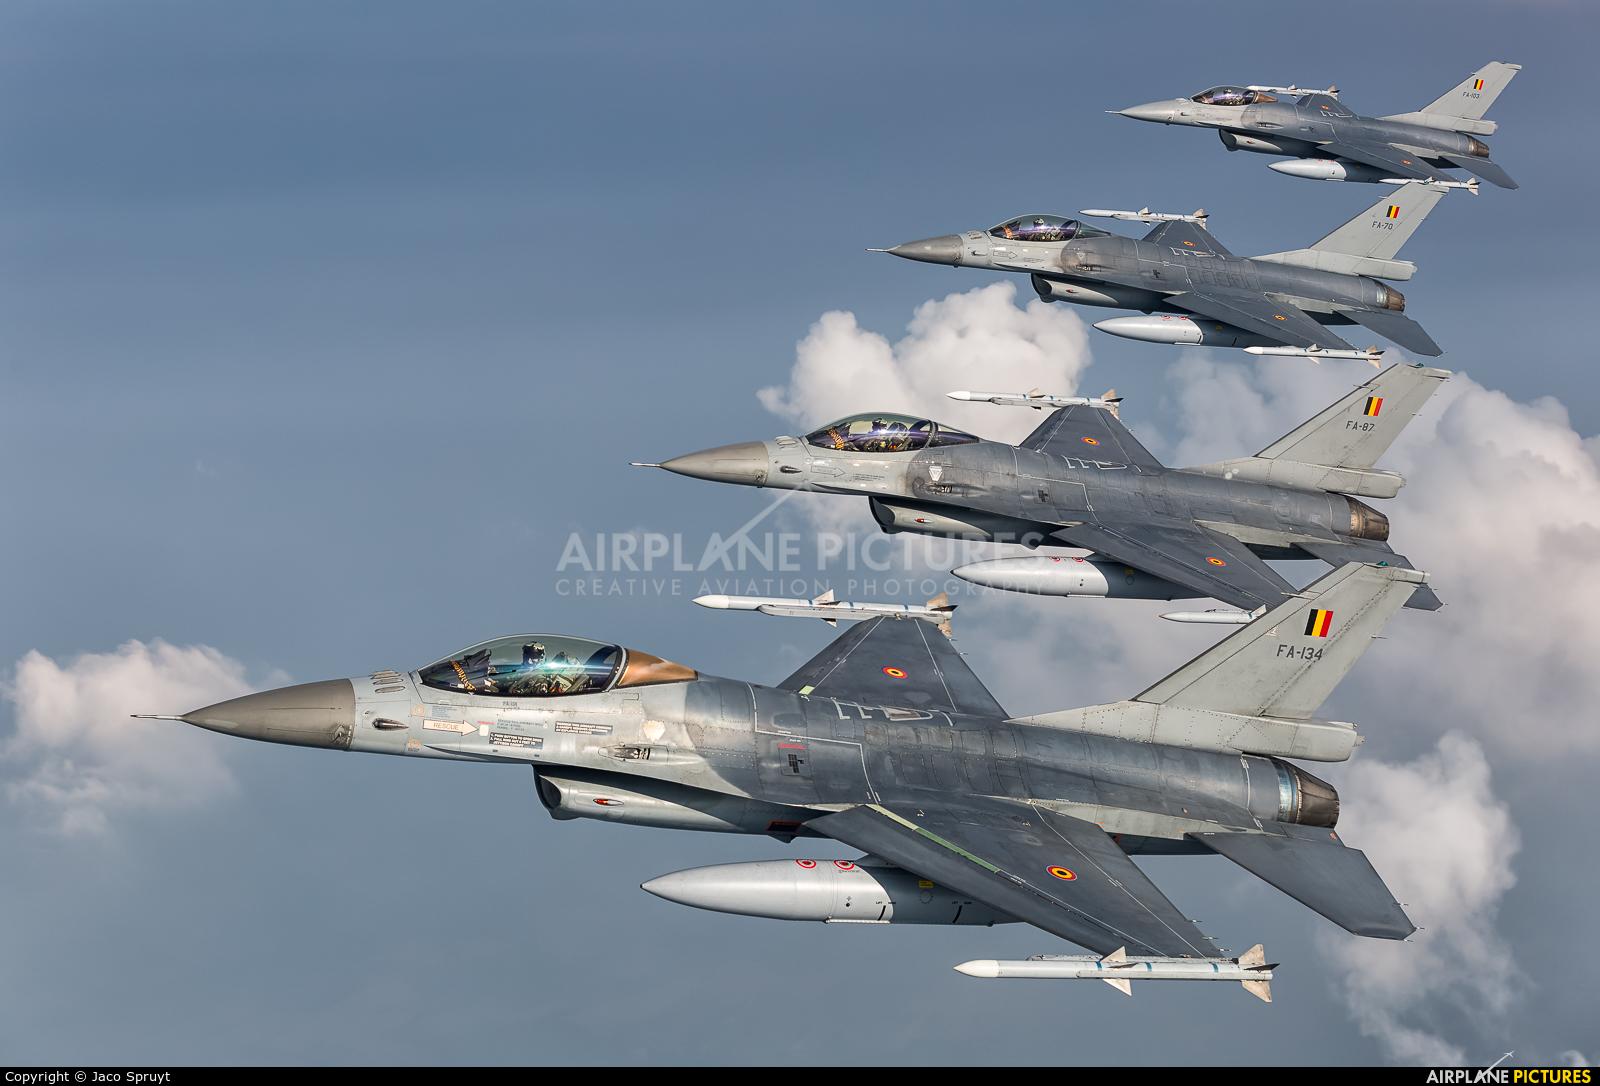 Belgium - Air Force FA-134 aircraft at In Flight - Belgium